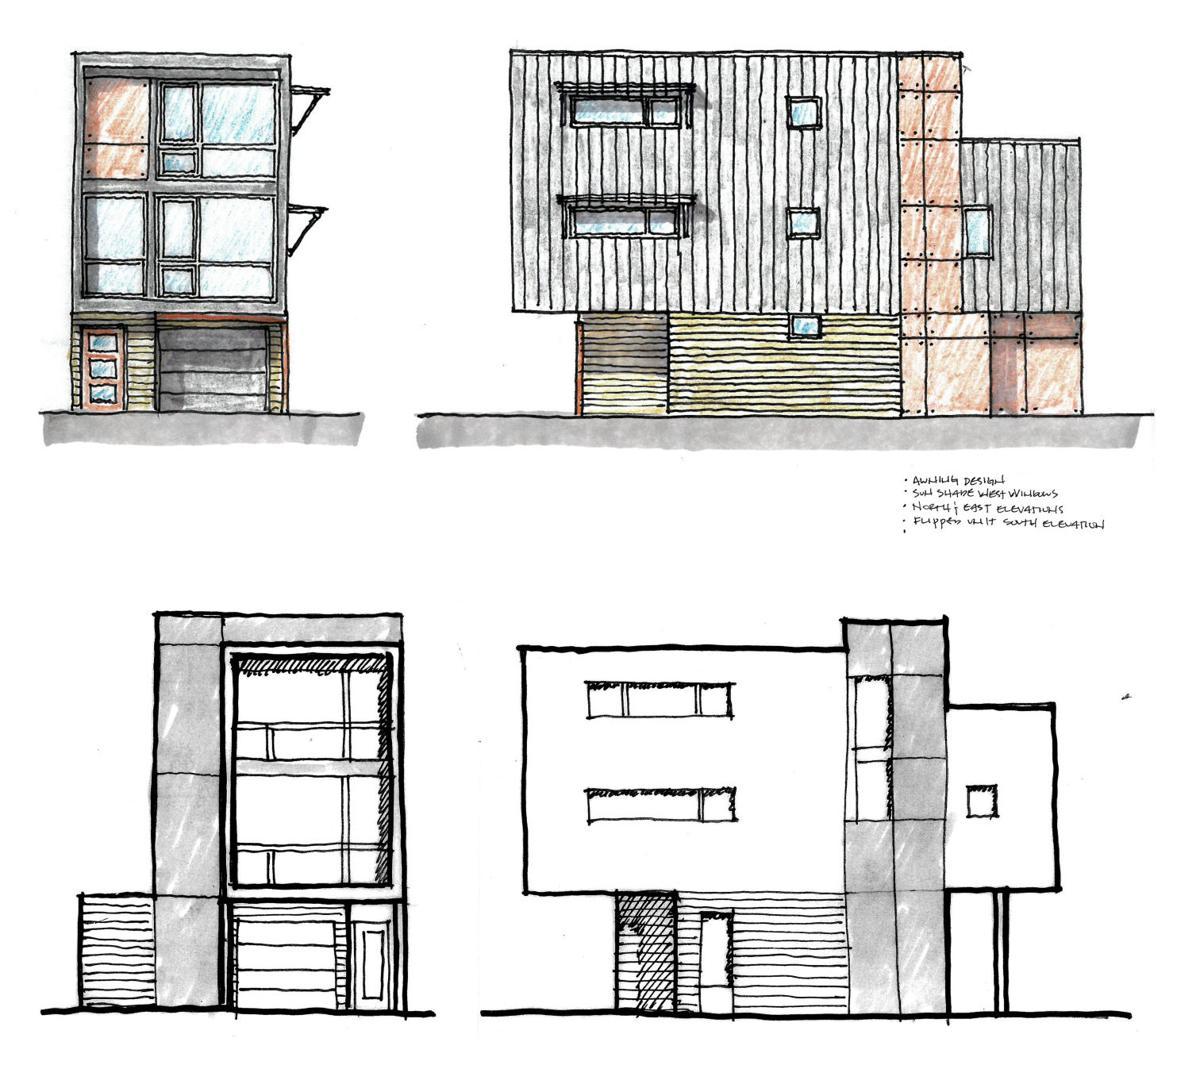 MMW Architects